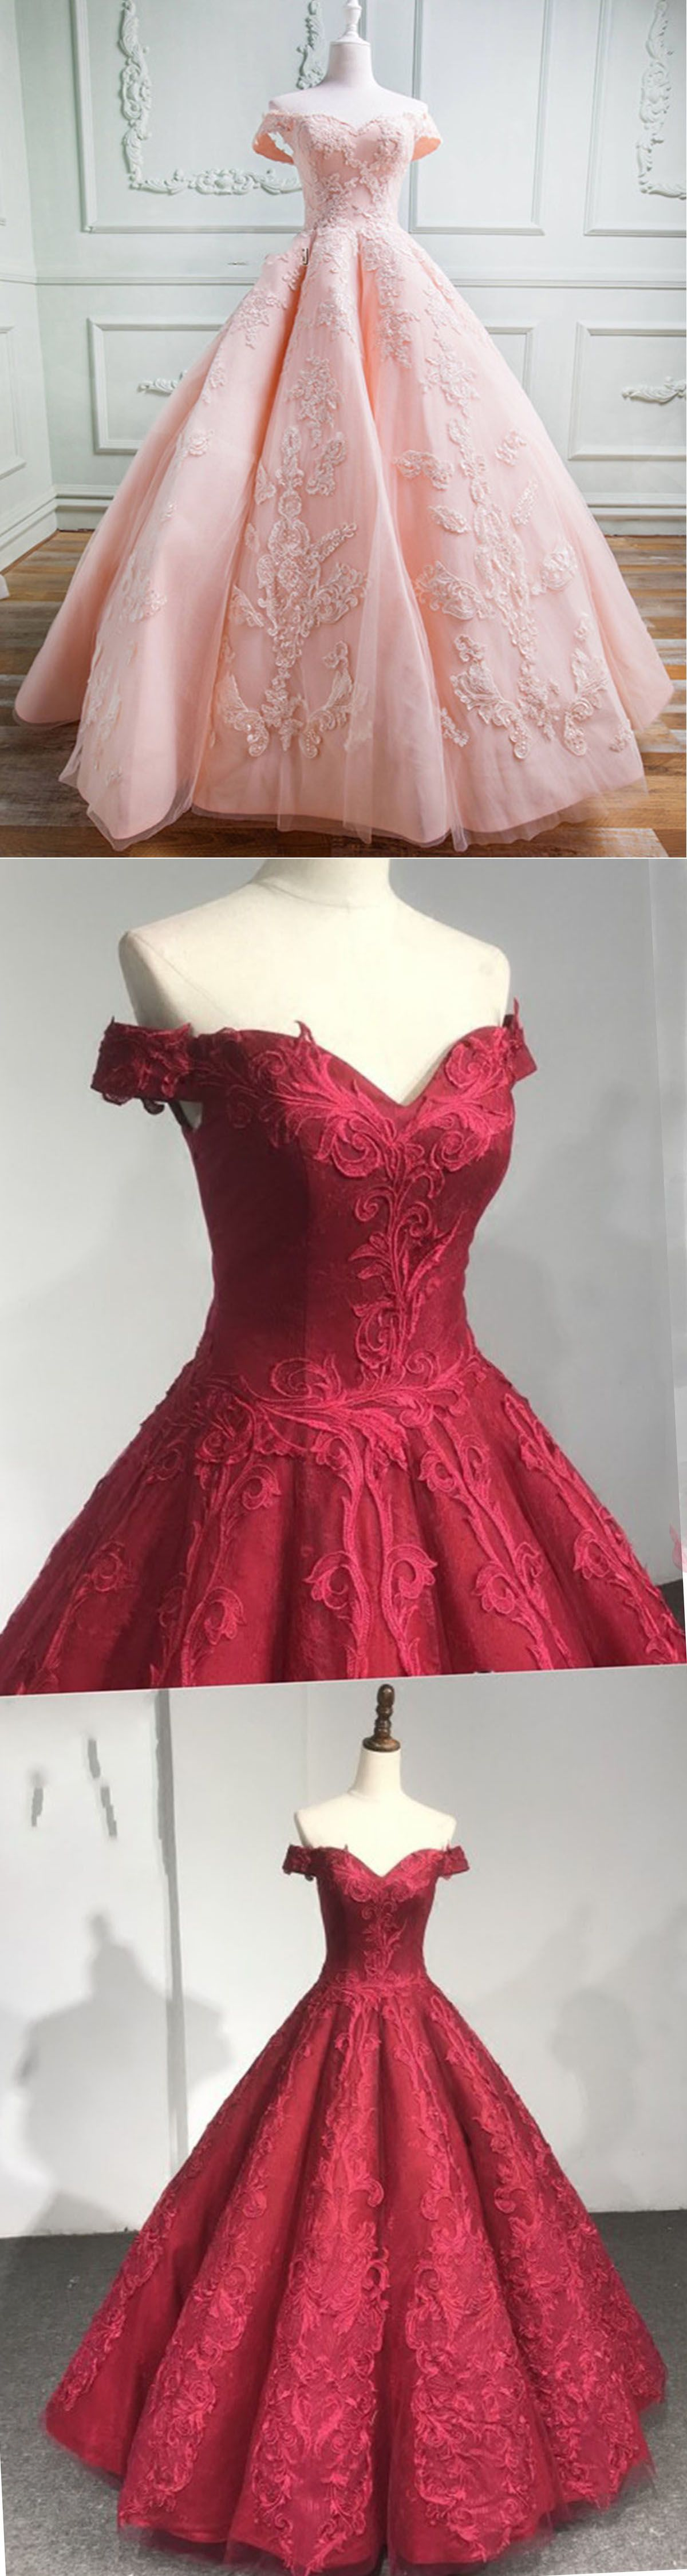 Lace prom dresses elegant off shoulder long poofy prom dress for